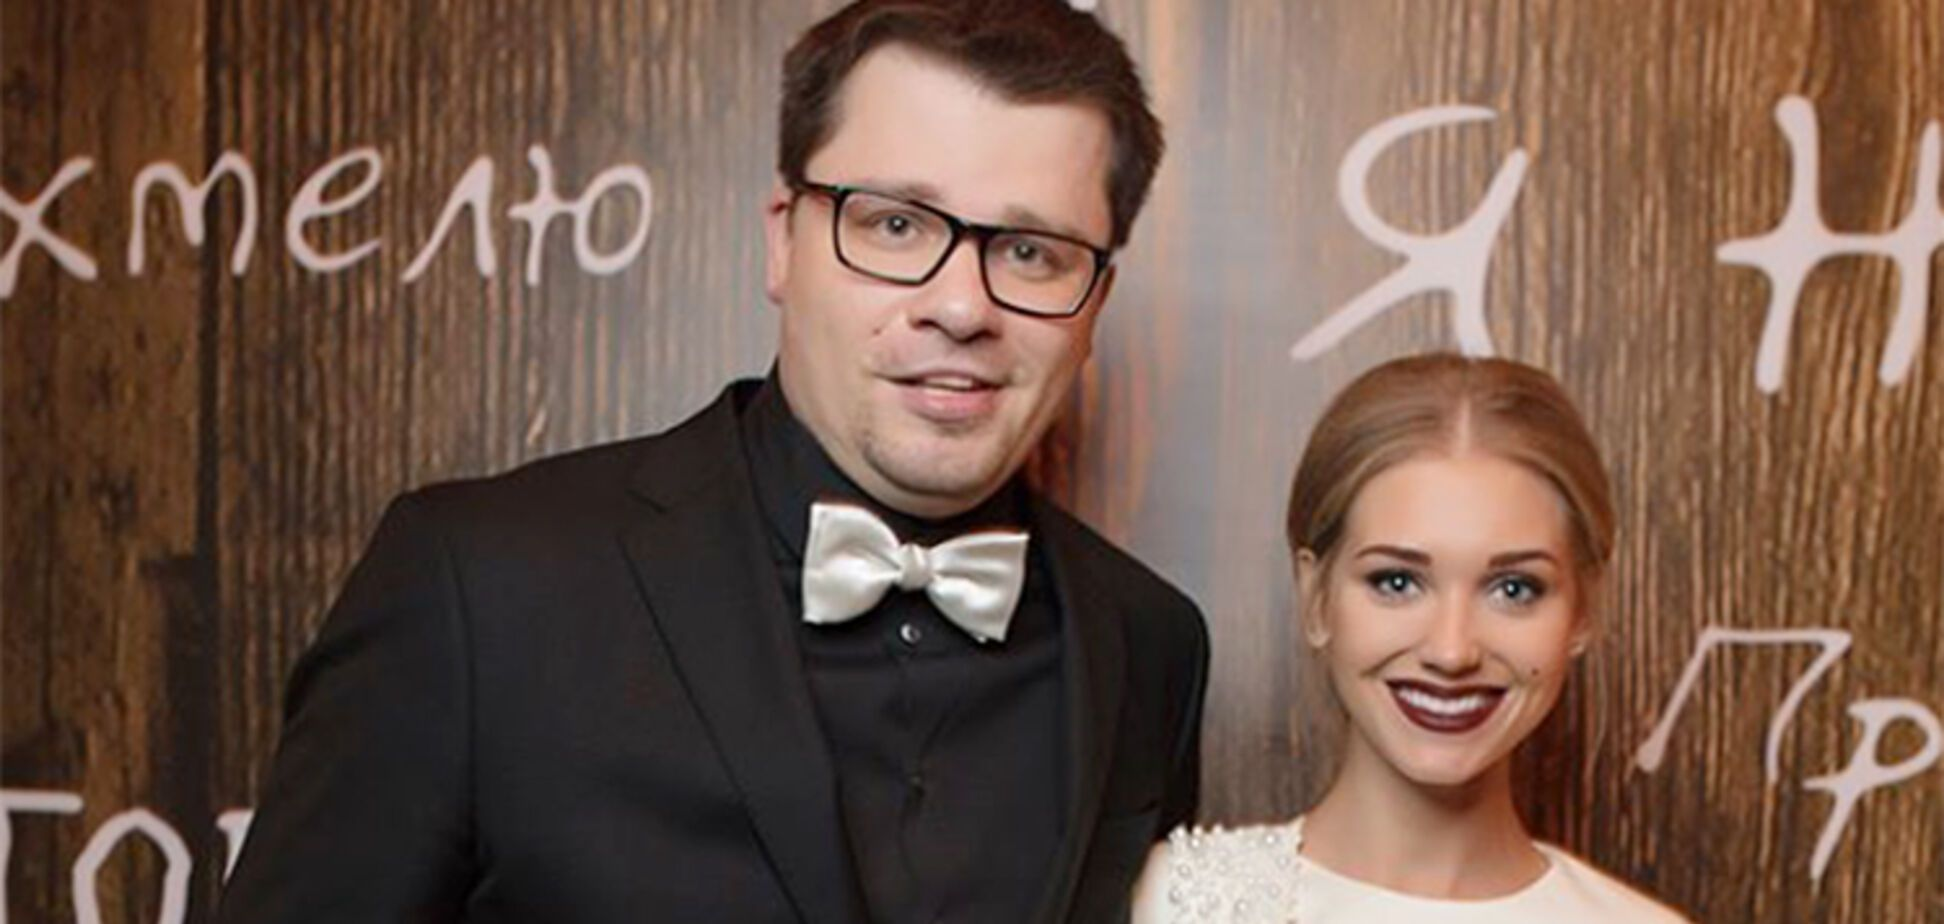 Гарік Харламов і Христина Асмус (фото – HELLO! Russia)